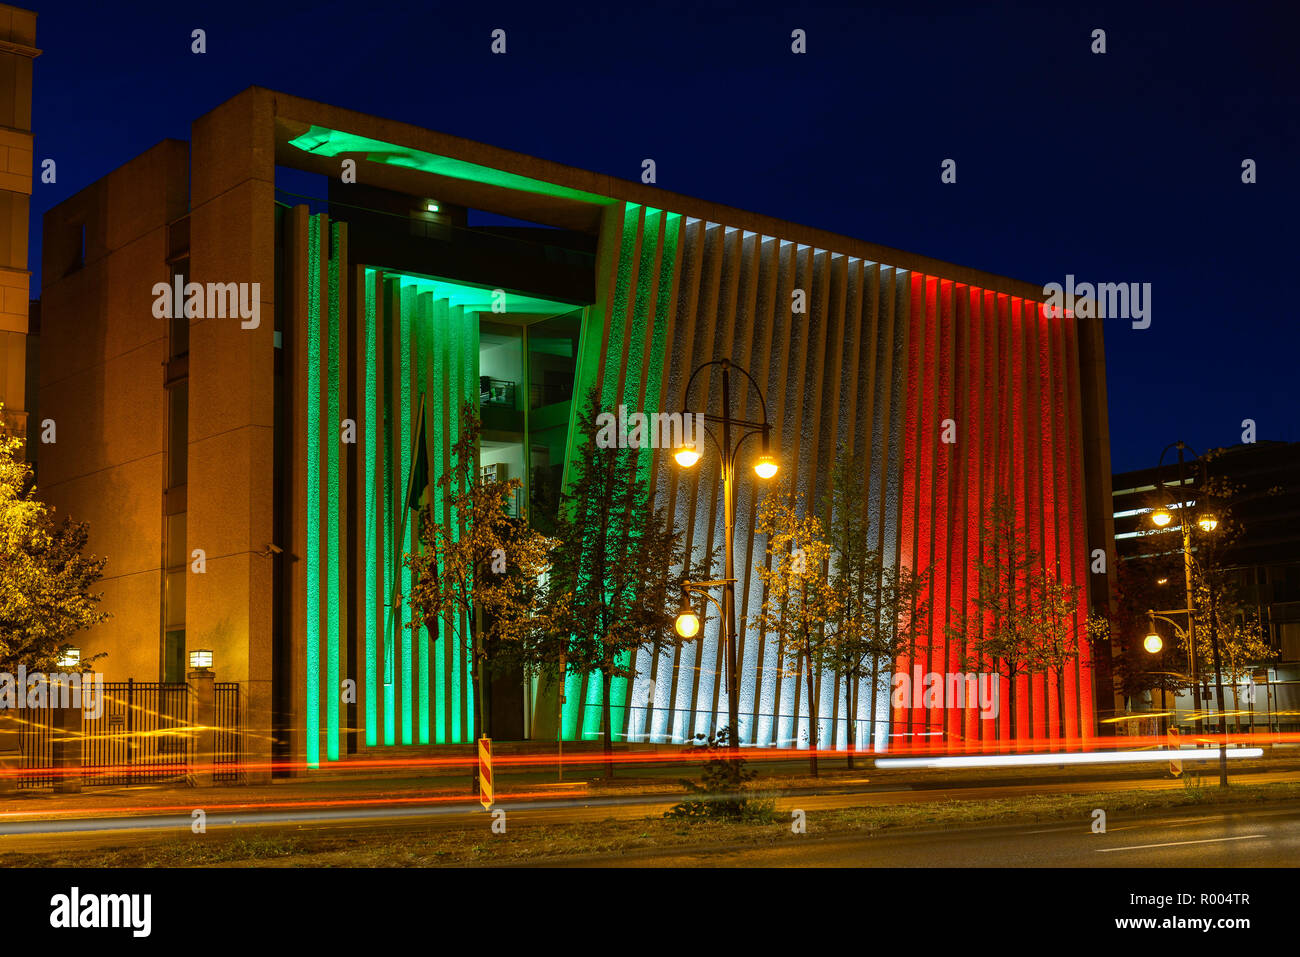 Festival of Lights, Mexican message, Klingelhöferstrasse, zoo, middle, Berlin, Germany, Mexikanische Botschaft, Klingelhoeferstrasse, Tiergarten, Mitt - Stock Image